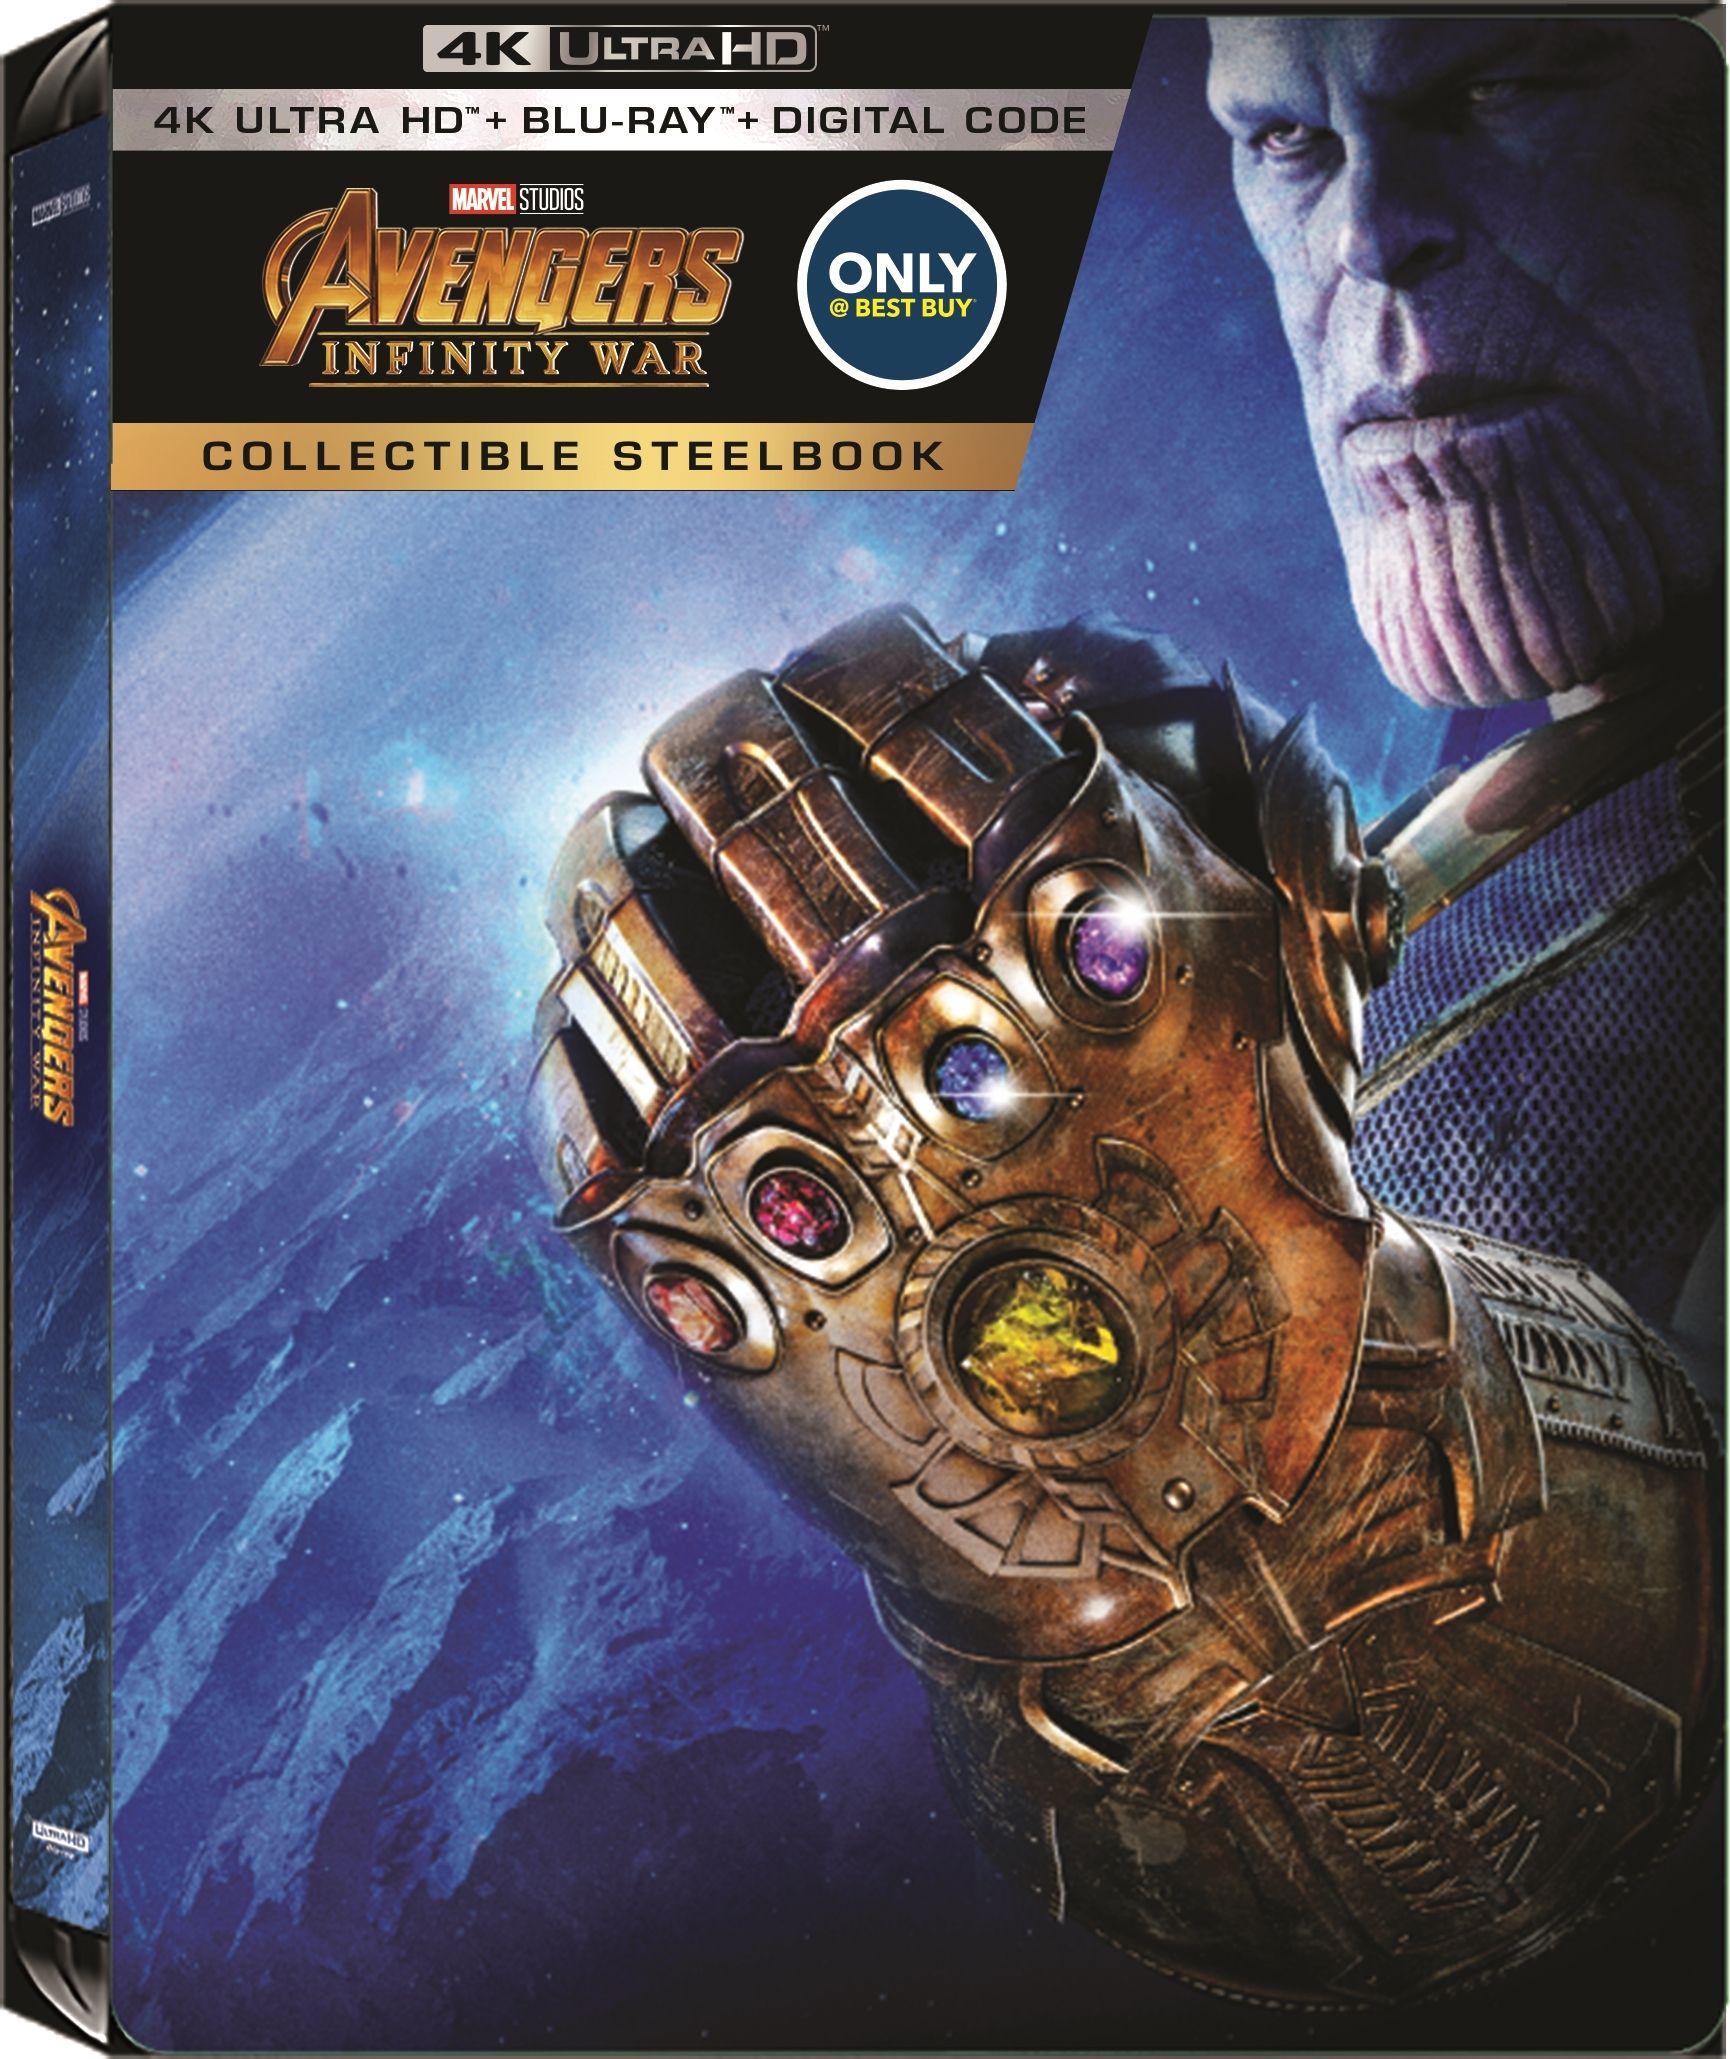 Avengers Infinity War 4k Blu Ray Best Buy Exclusive Steelbook Infinity War Avengers Infinity War Cool Things To Buy